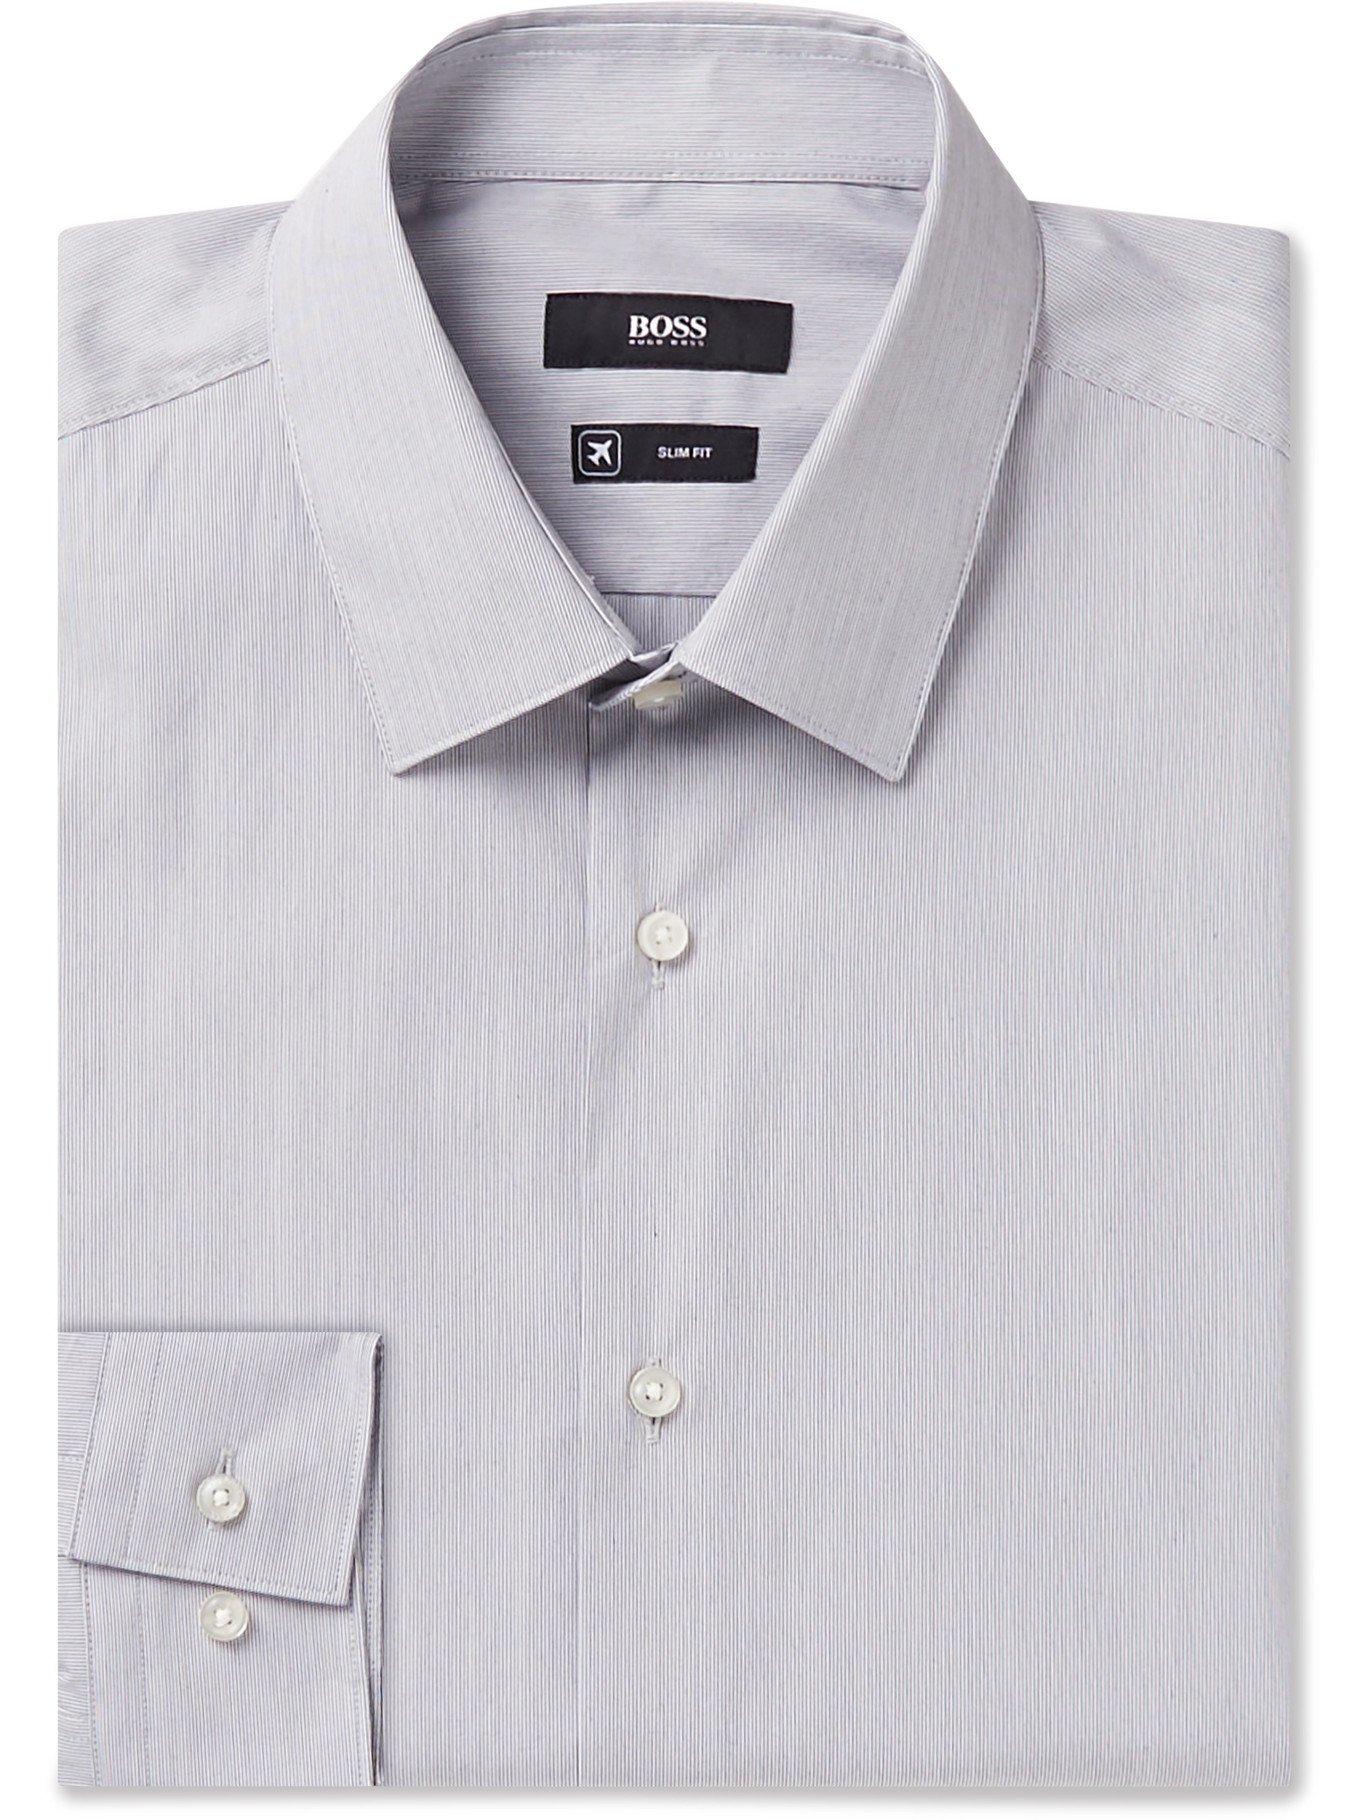 HUGO BOSS - Slim-Fit Pinstriped Cotton-Blend Poplin Shirt - Black